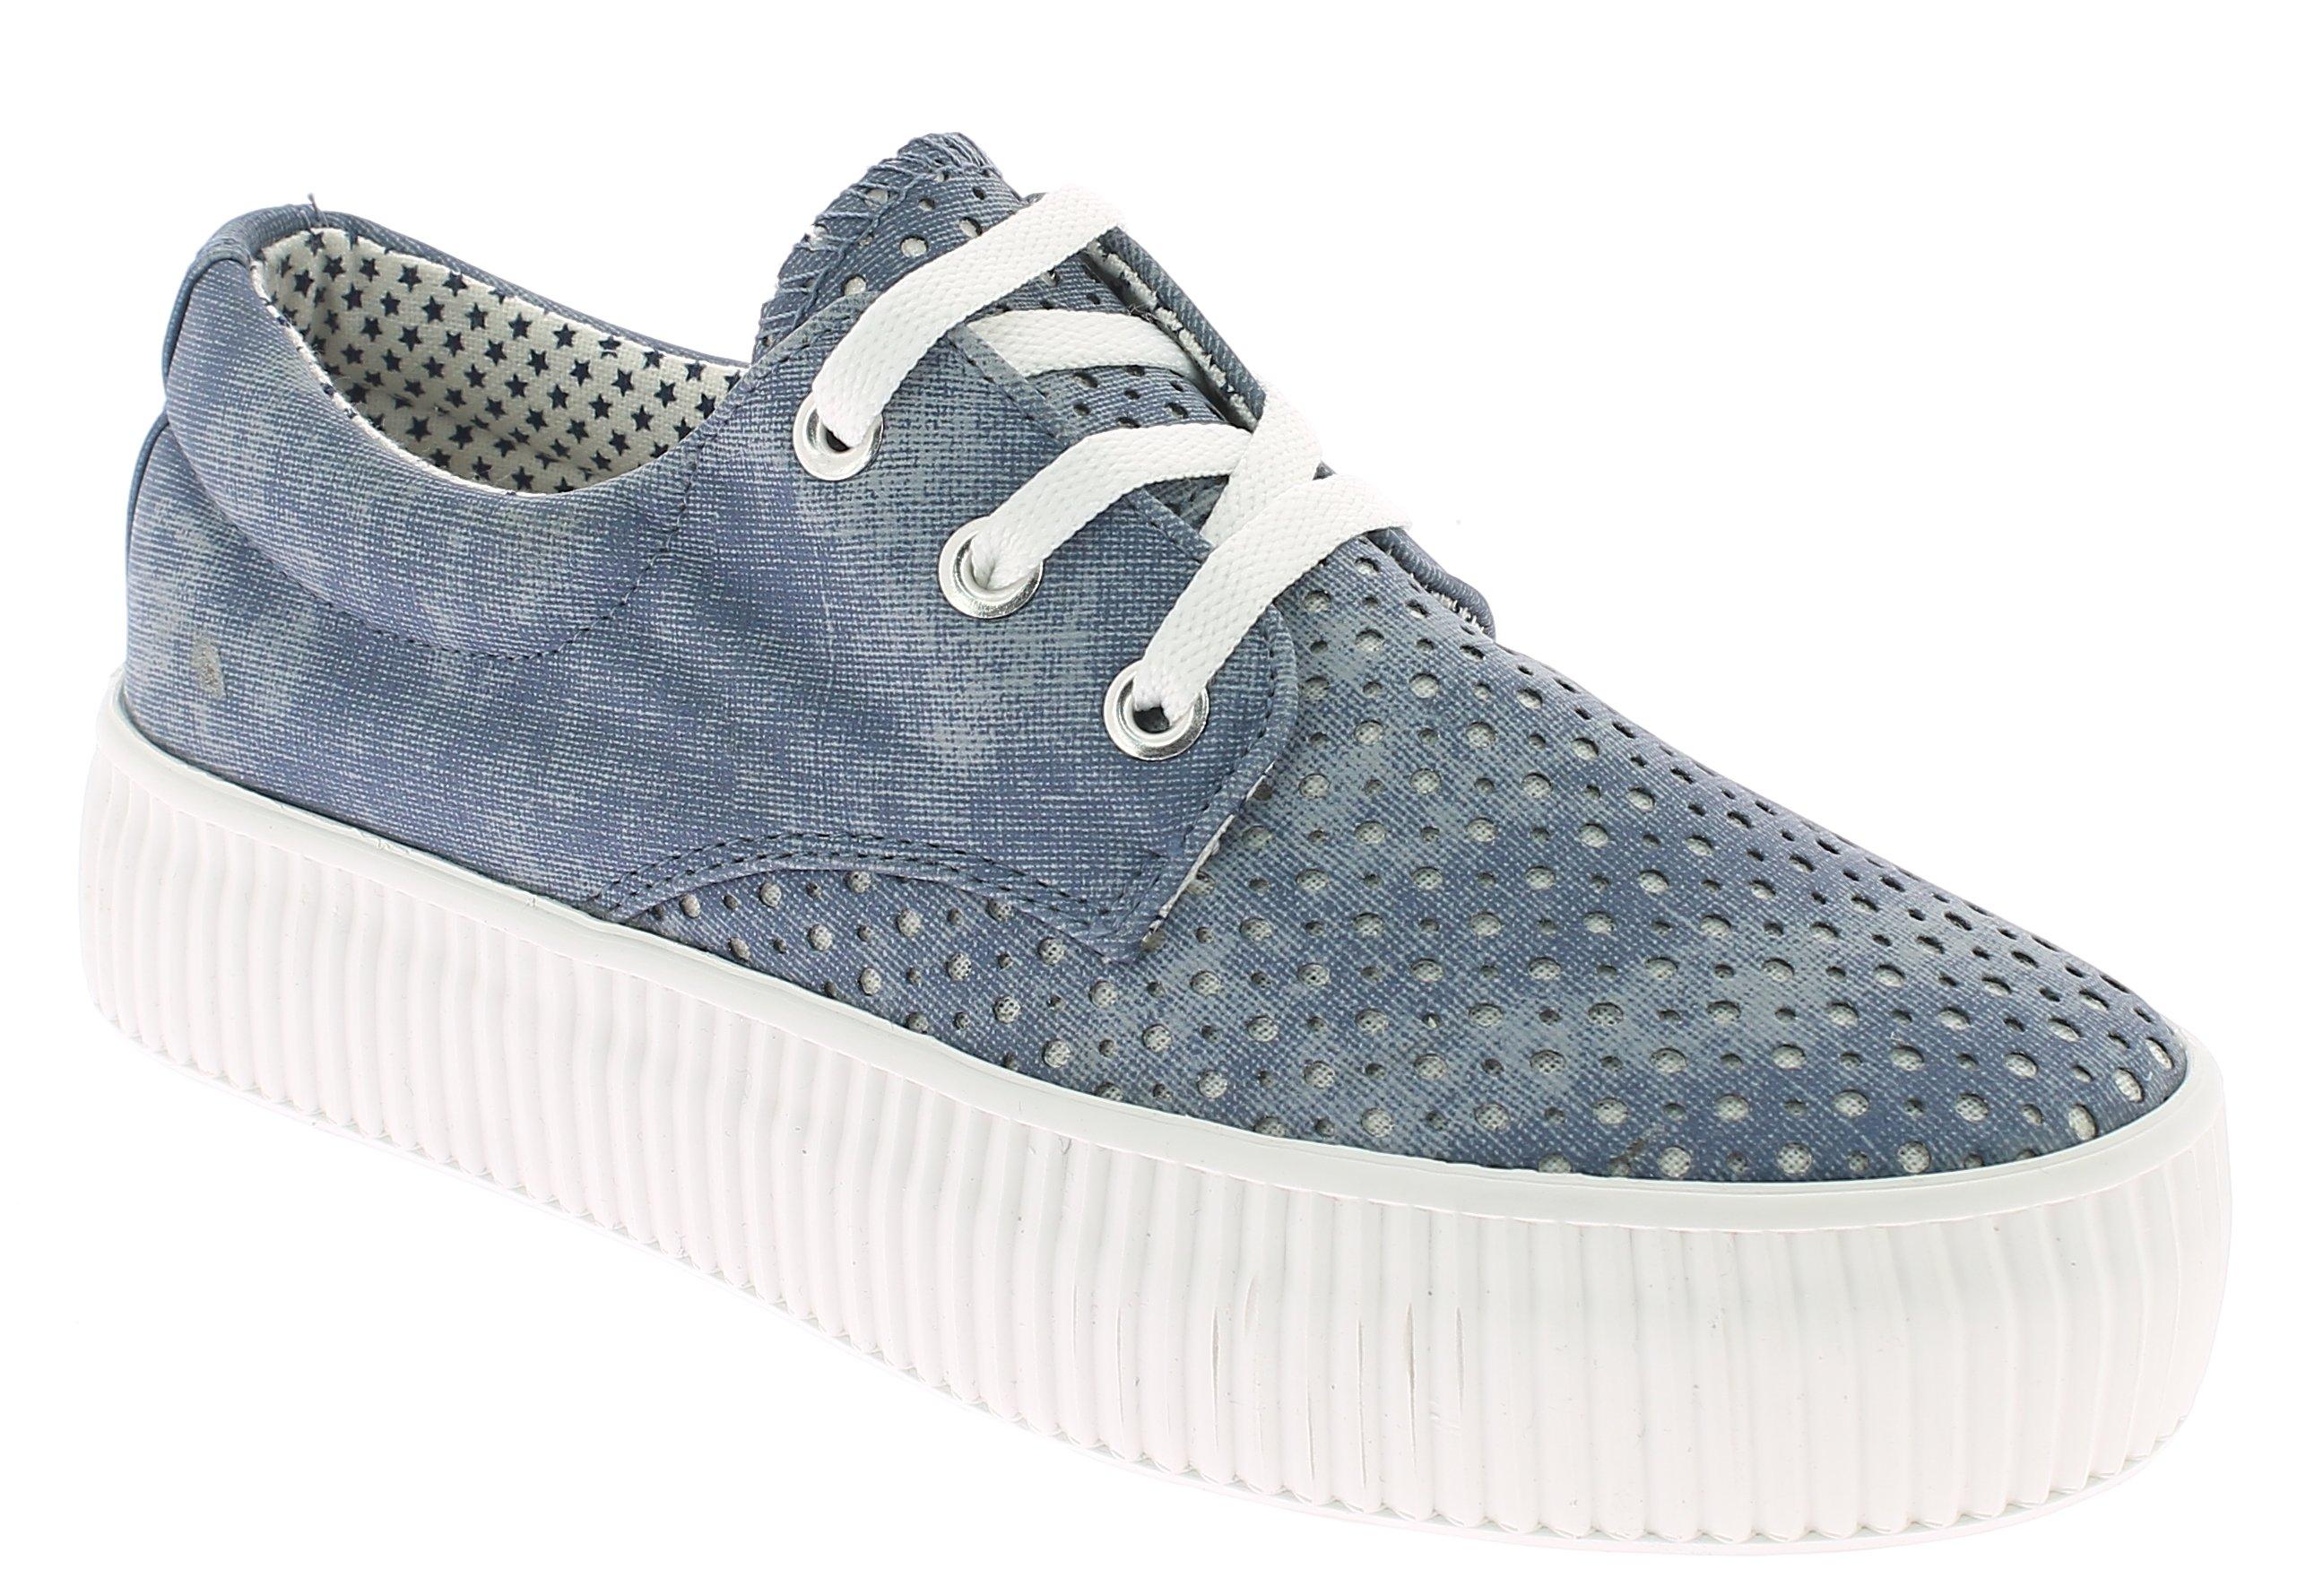 KYLIE Γυναικείο Casual K1720301 Τζίν - IqShoes - Κ1720301 JEAN-blue-36/1/23/7 προϊόντα παπούτσια